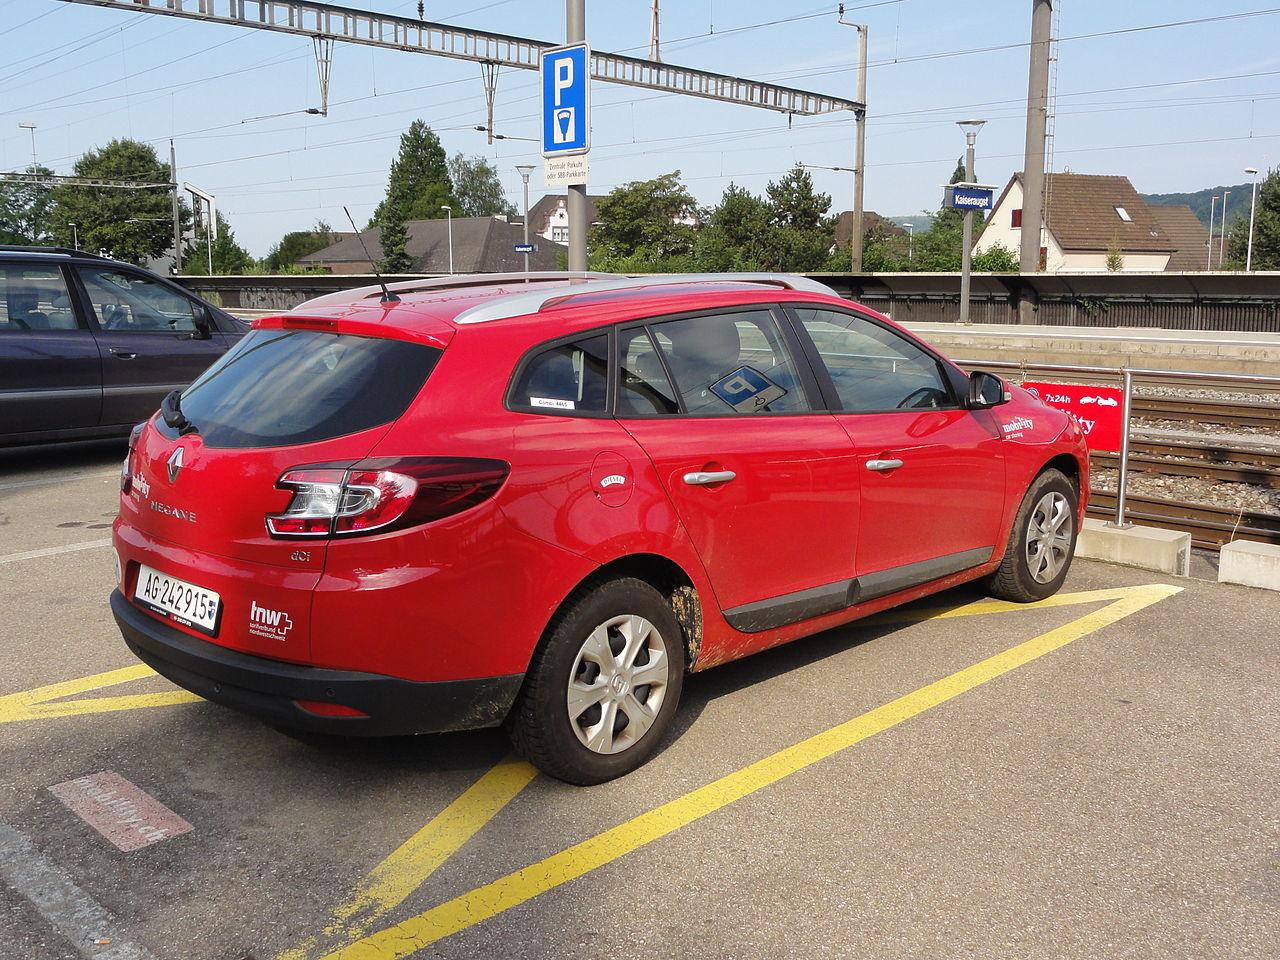 Mobility_Wikipedia_Kaiseraugst